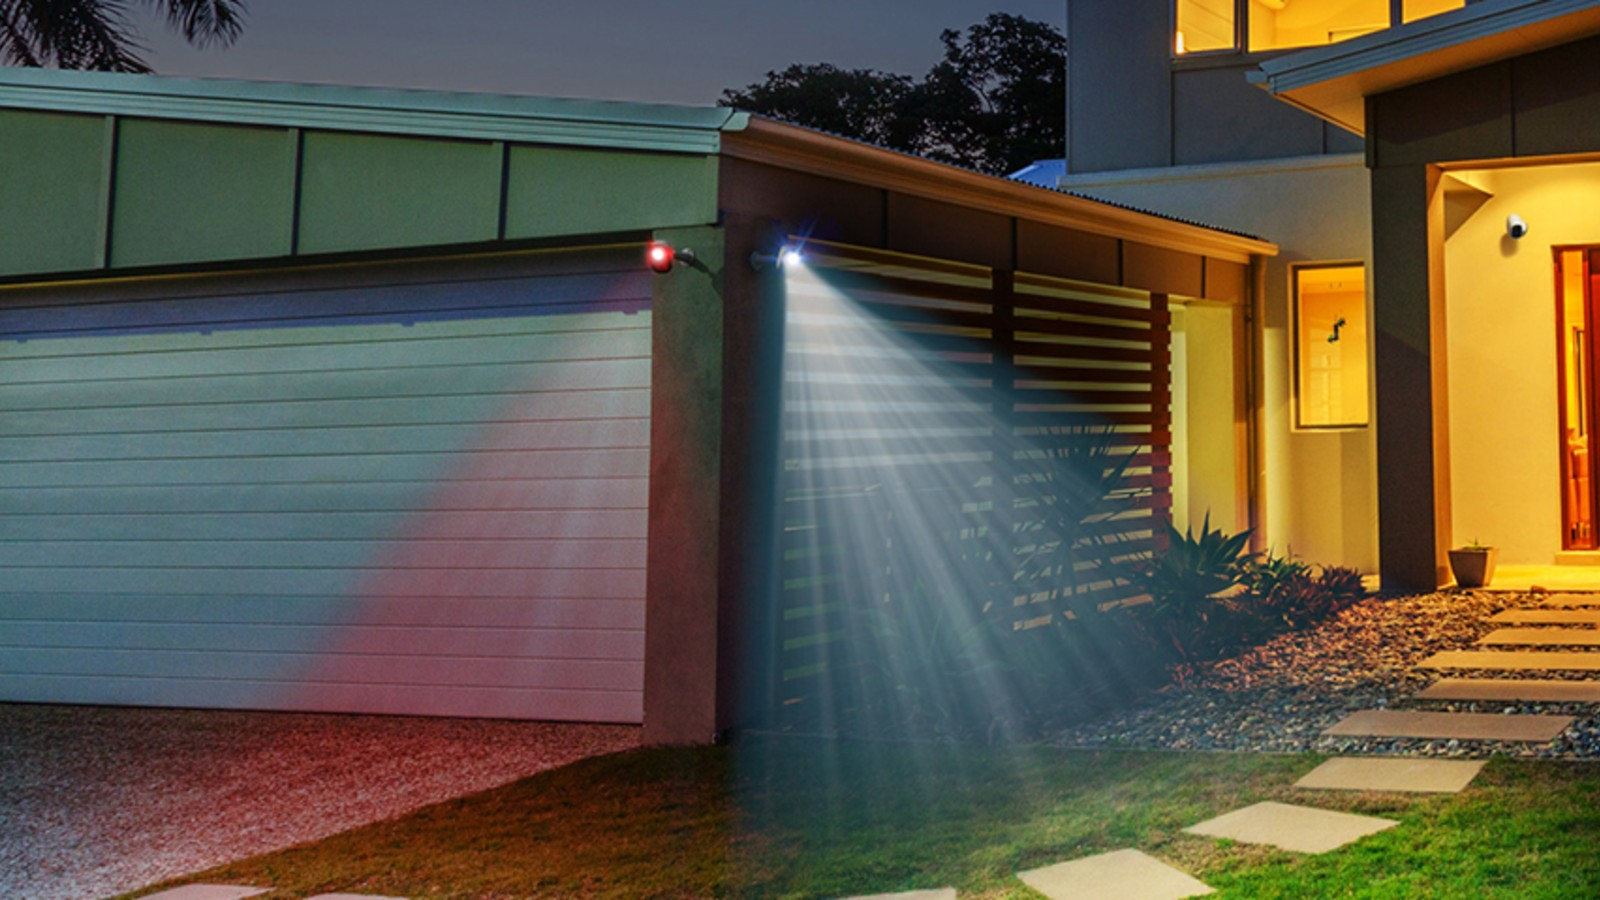 Ways to Improve Your Garage Security